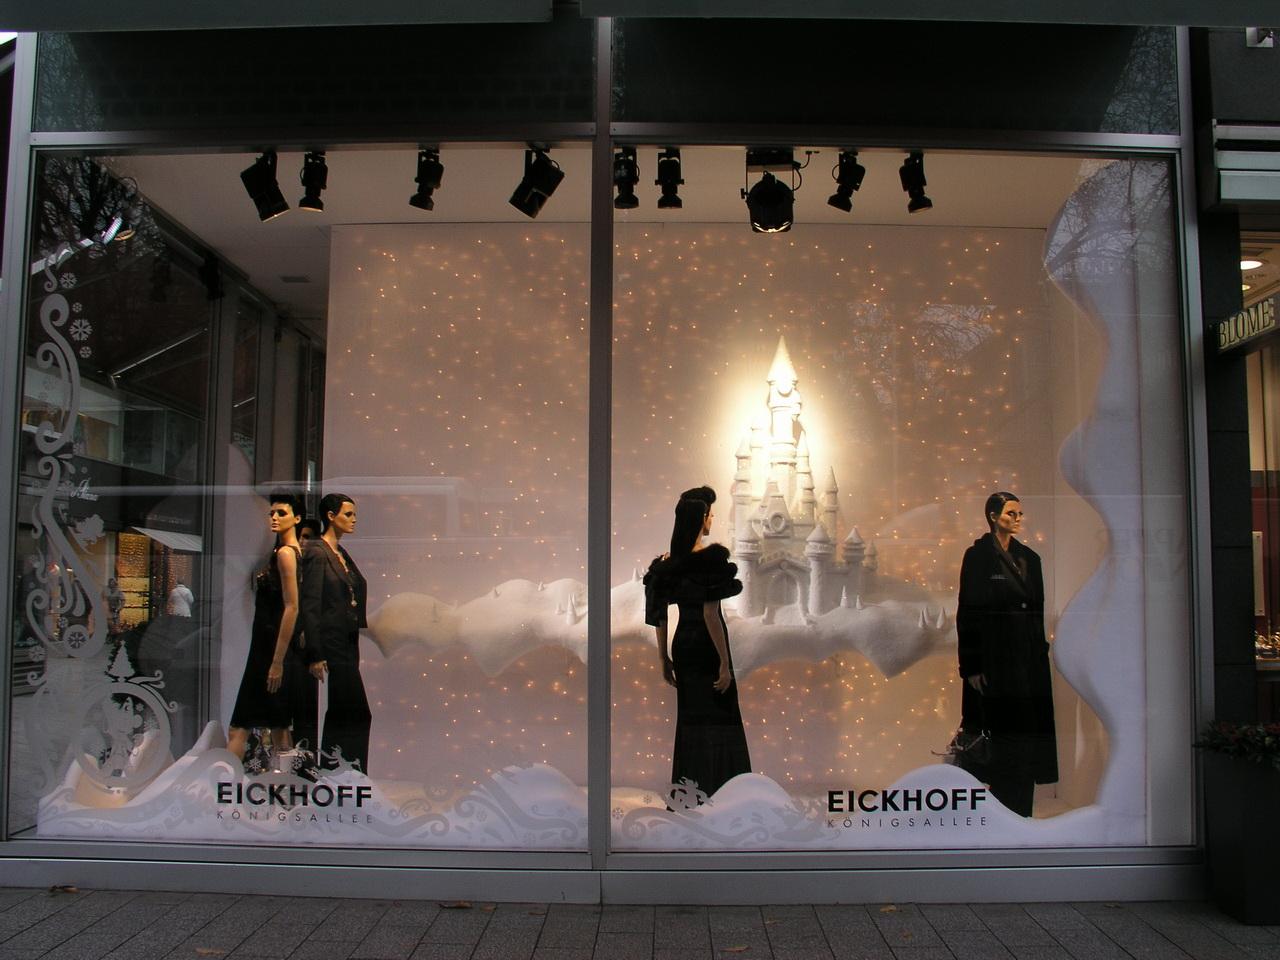 Eickhoff Werbung Kö Düsseldorf